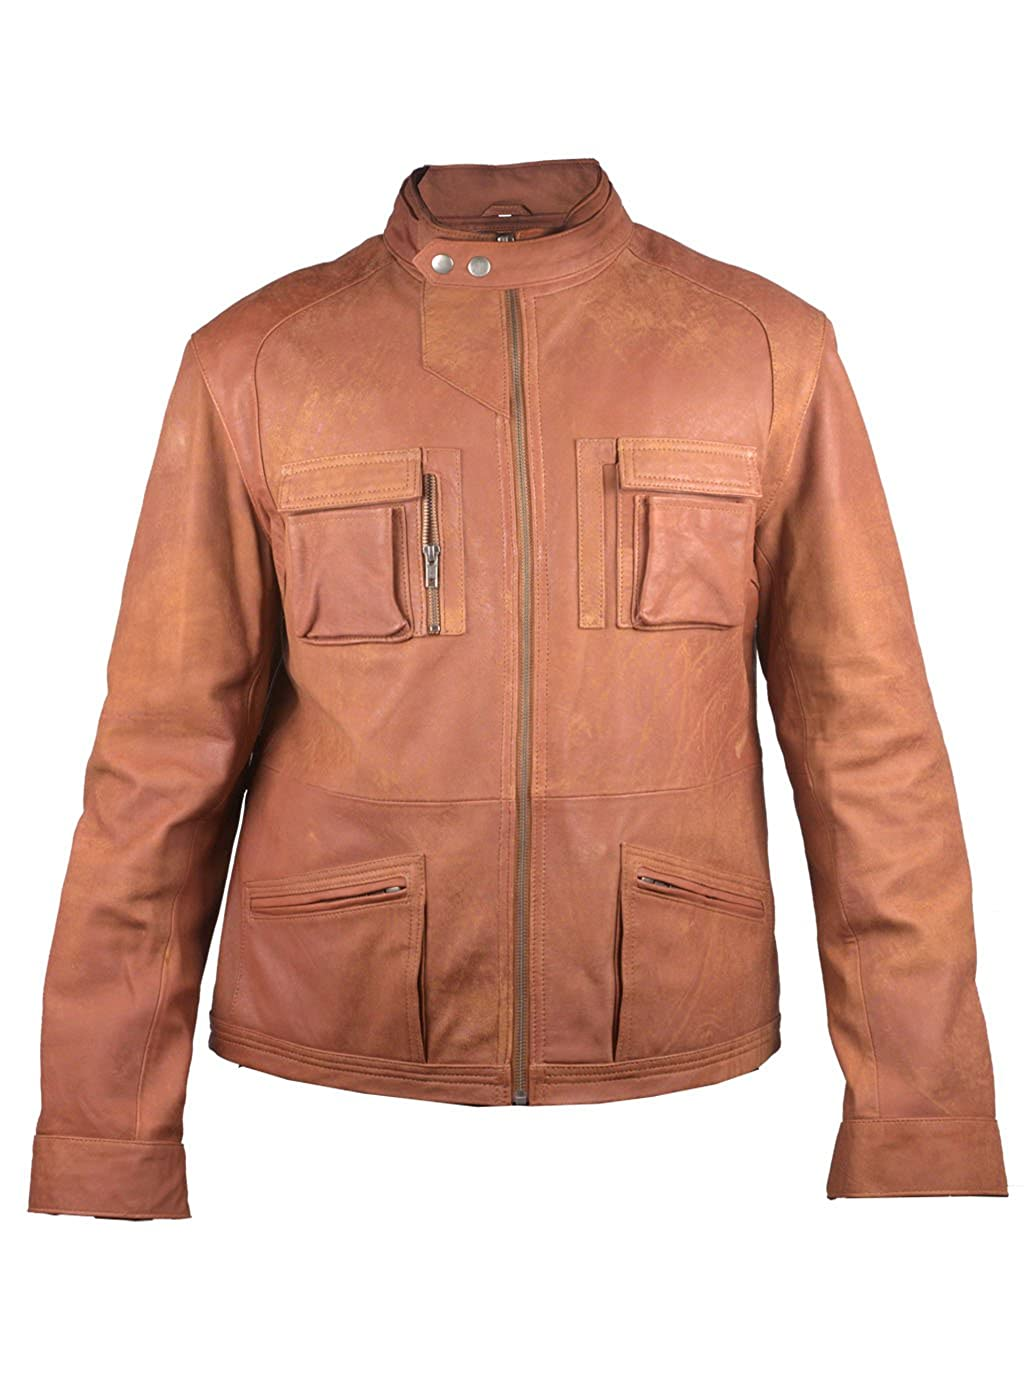 FactoryExtreme Milano Mens Black or Tan Brown Leather Jacket at ...